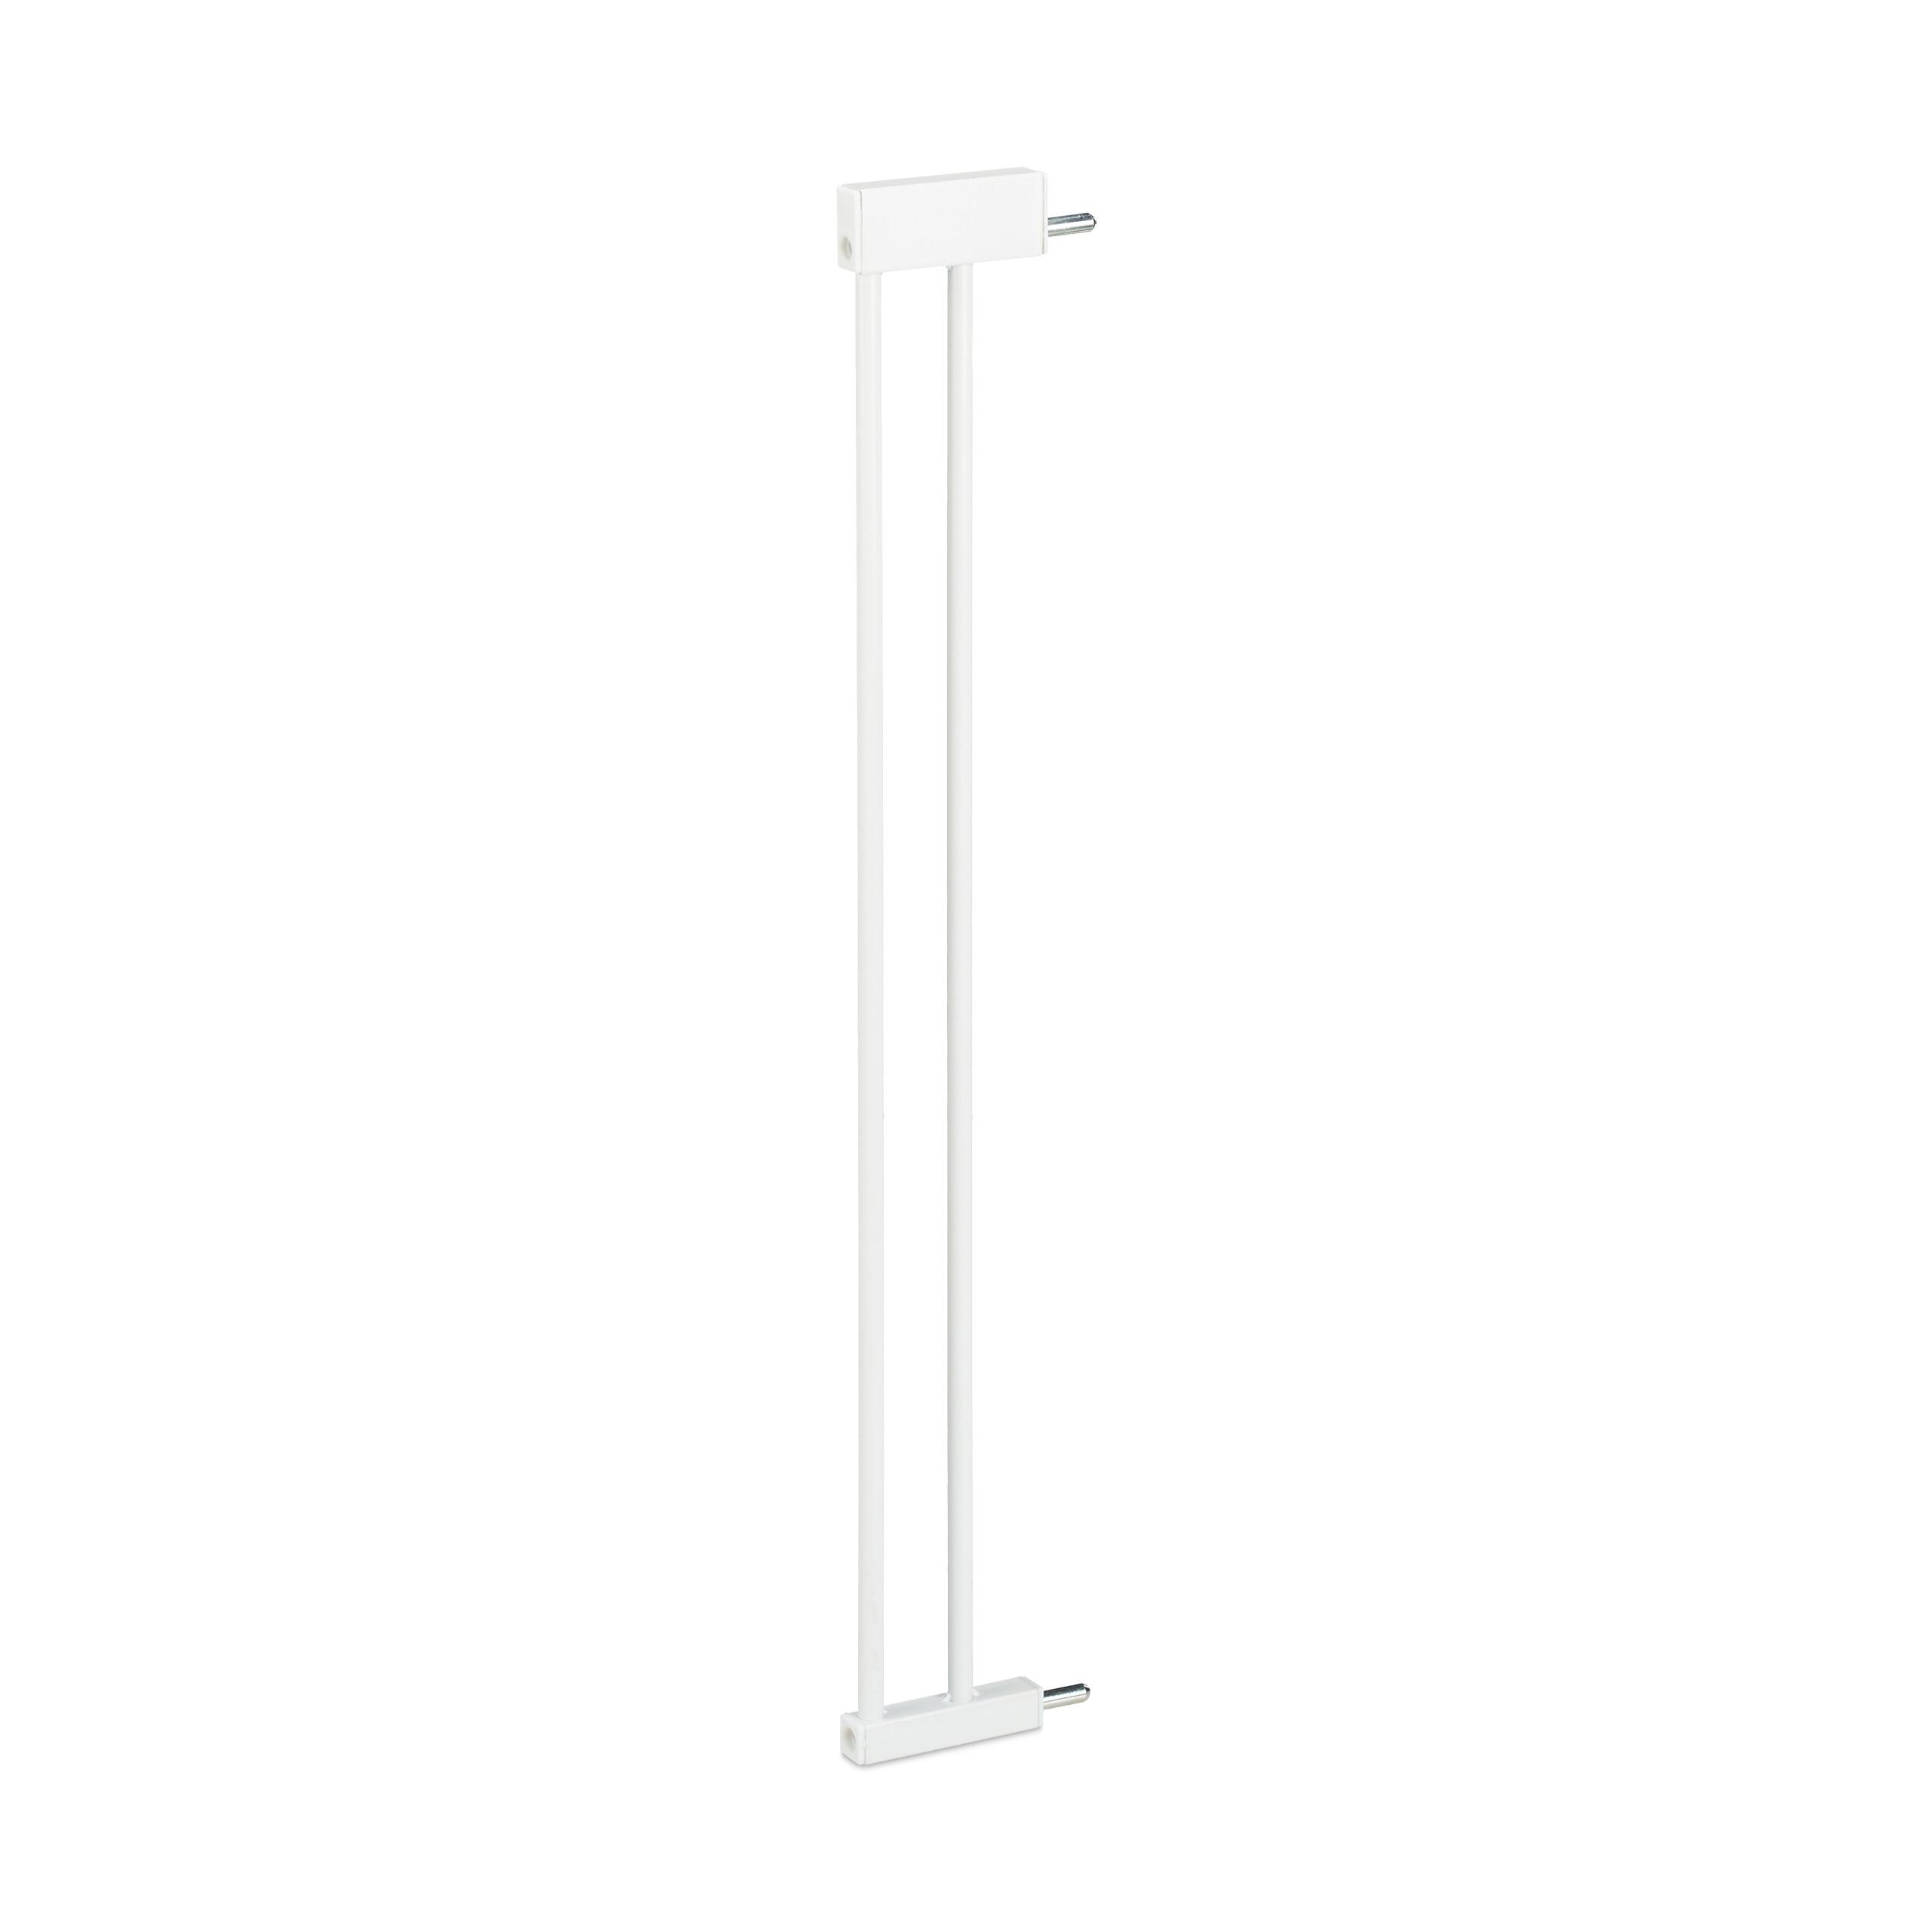 Verl/ängerung KIDIMAX Treppenschutzgitter Erweiterung wei/ß 20 cm steckbarer Gitter Aufsatz f/ür Treppenschutz